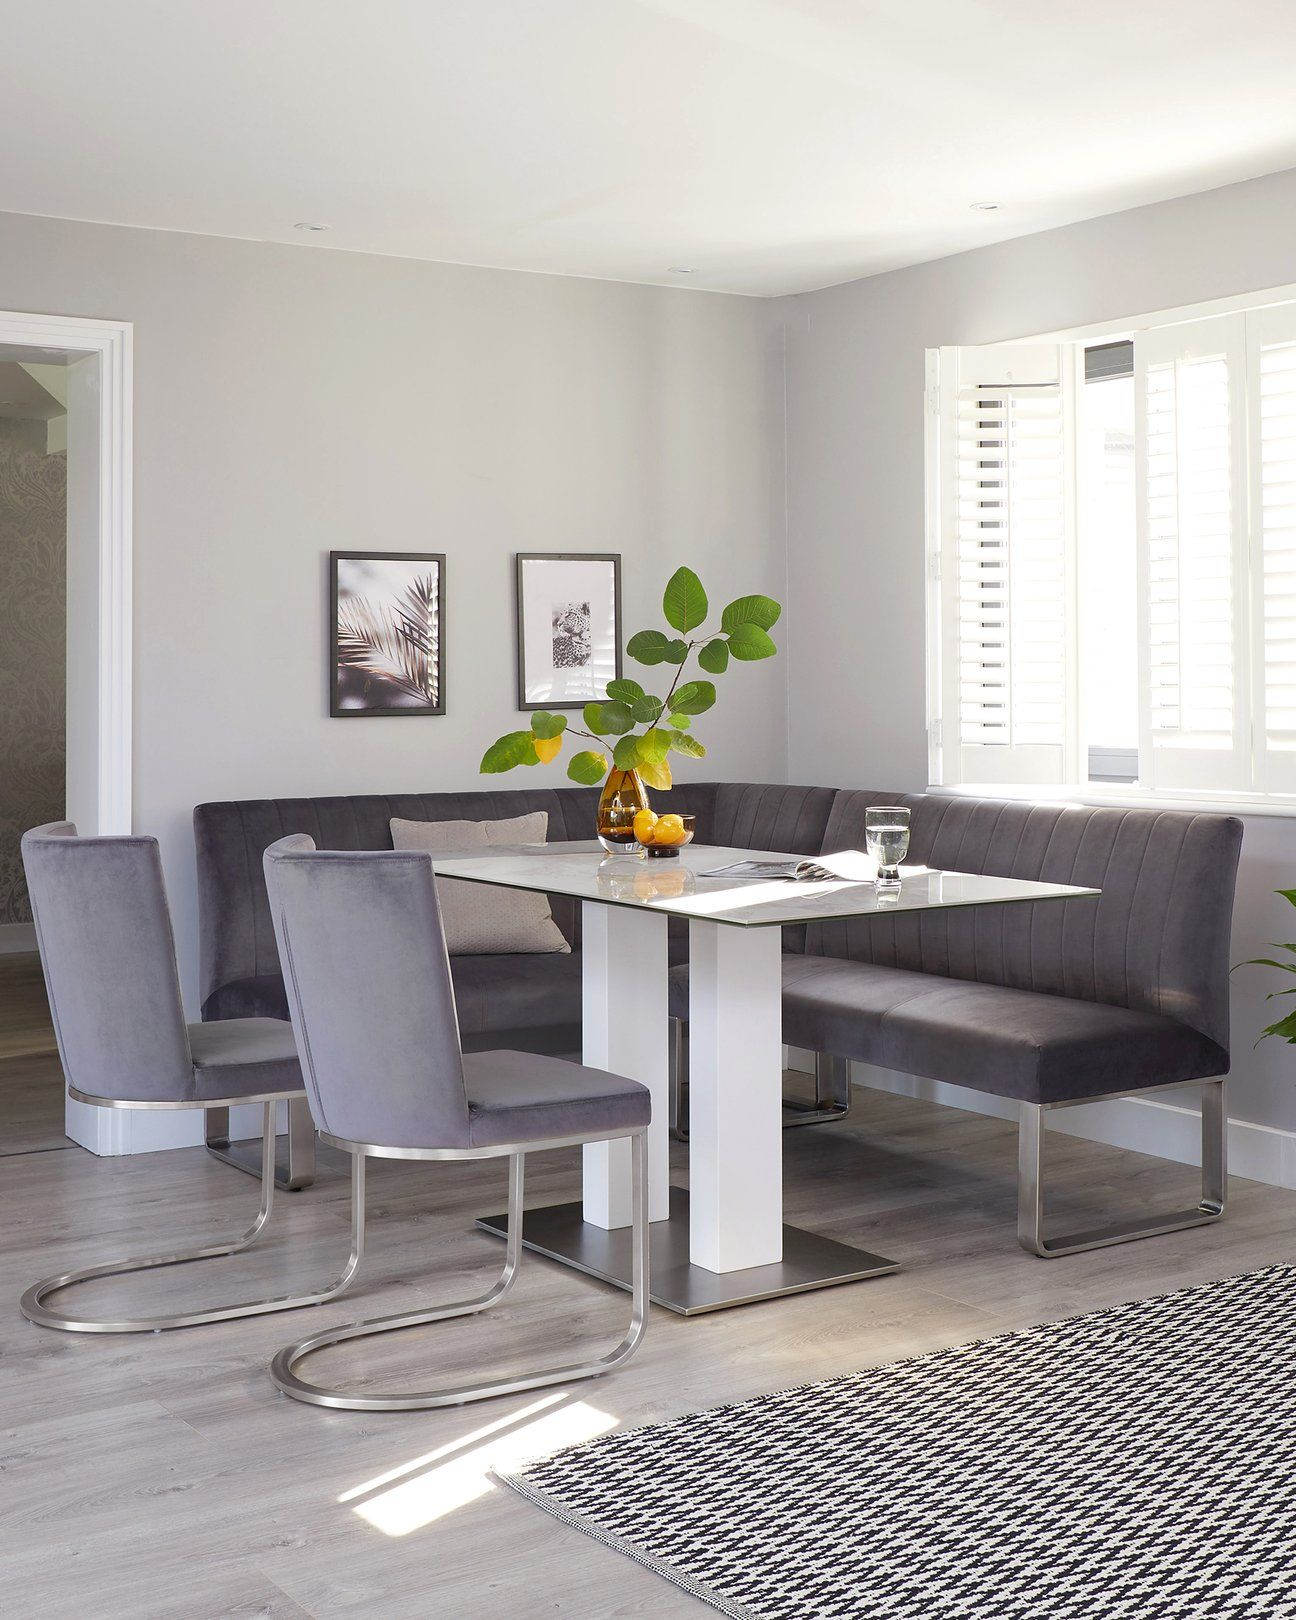 Mia Ceramic With Ophelia Corner Bench And Form Velvet Dining Set